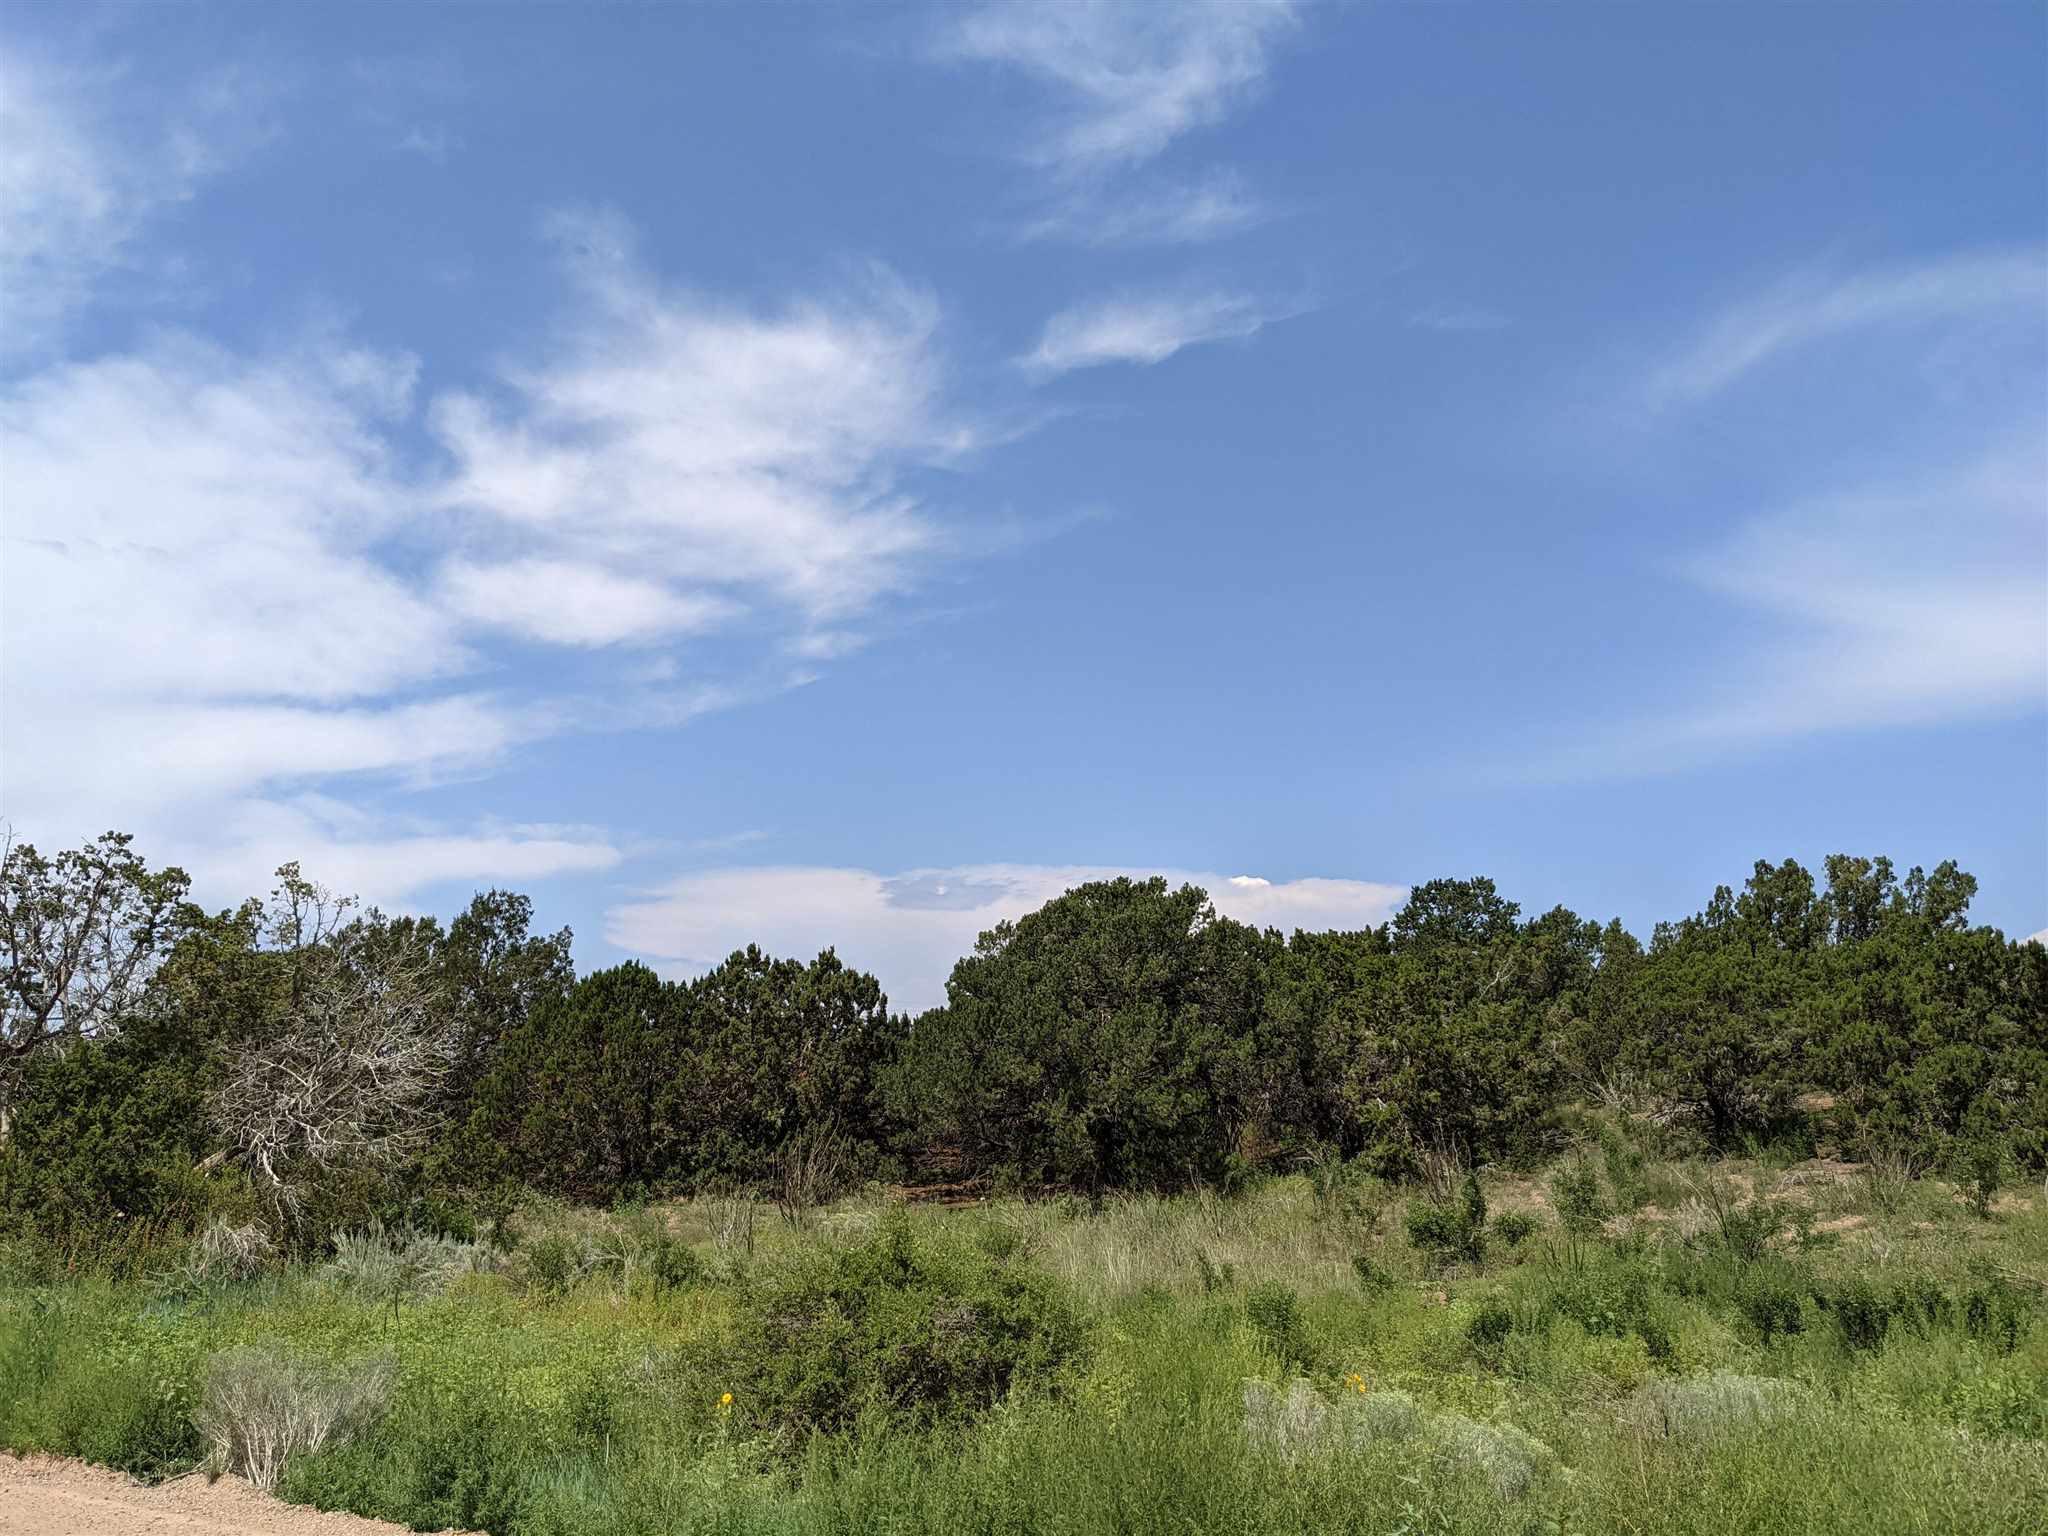 12 Camino Valle, Lamy NM 87508 - Photo 2